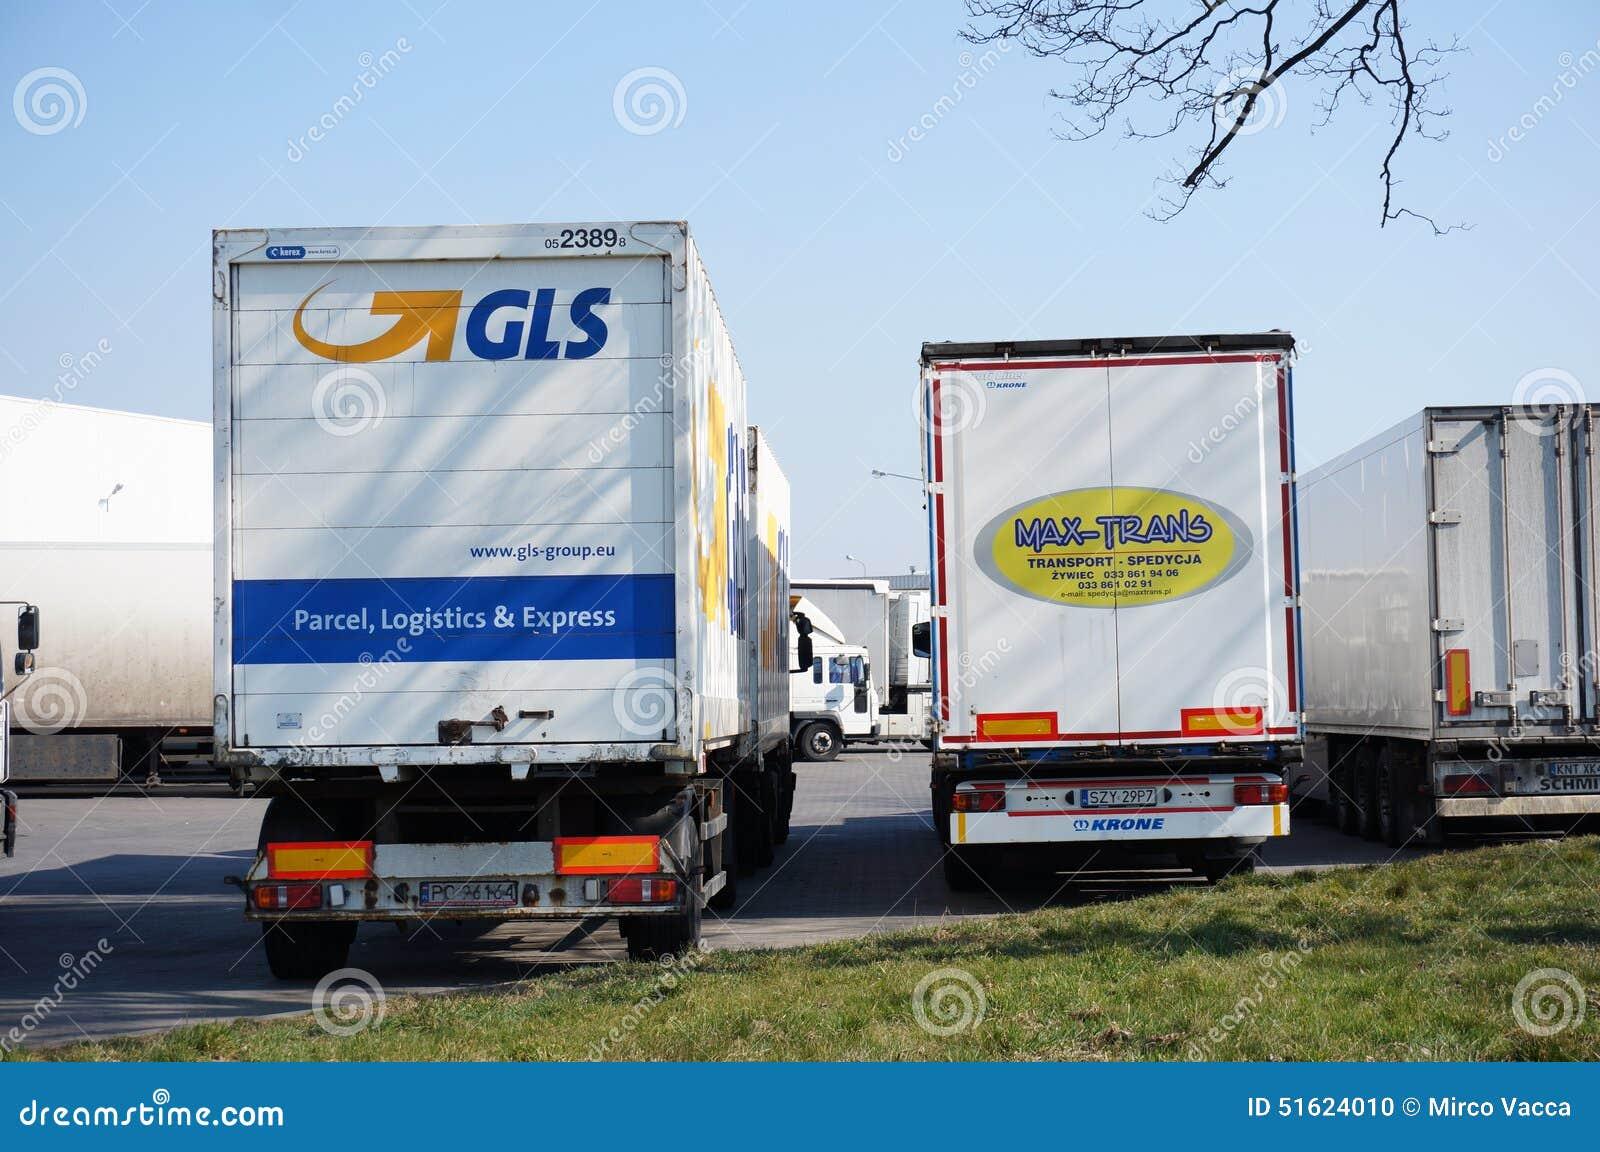 gls and max trans trucks editorial image image 51624010. Black Bedroom Furniture Sets. Home Design Ideas